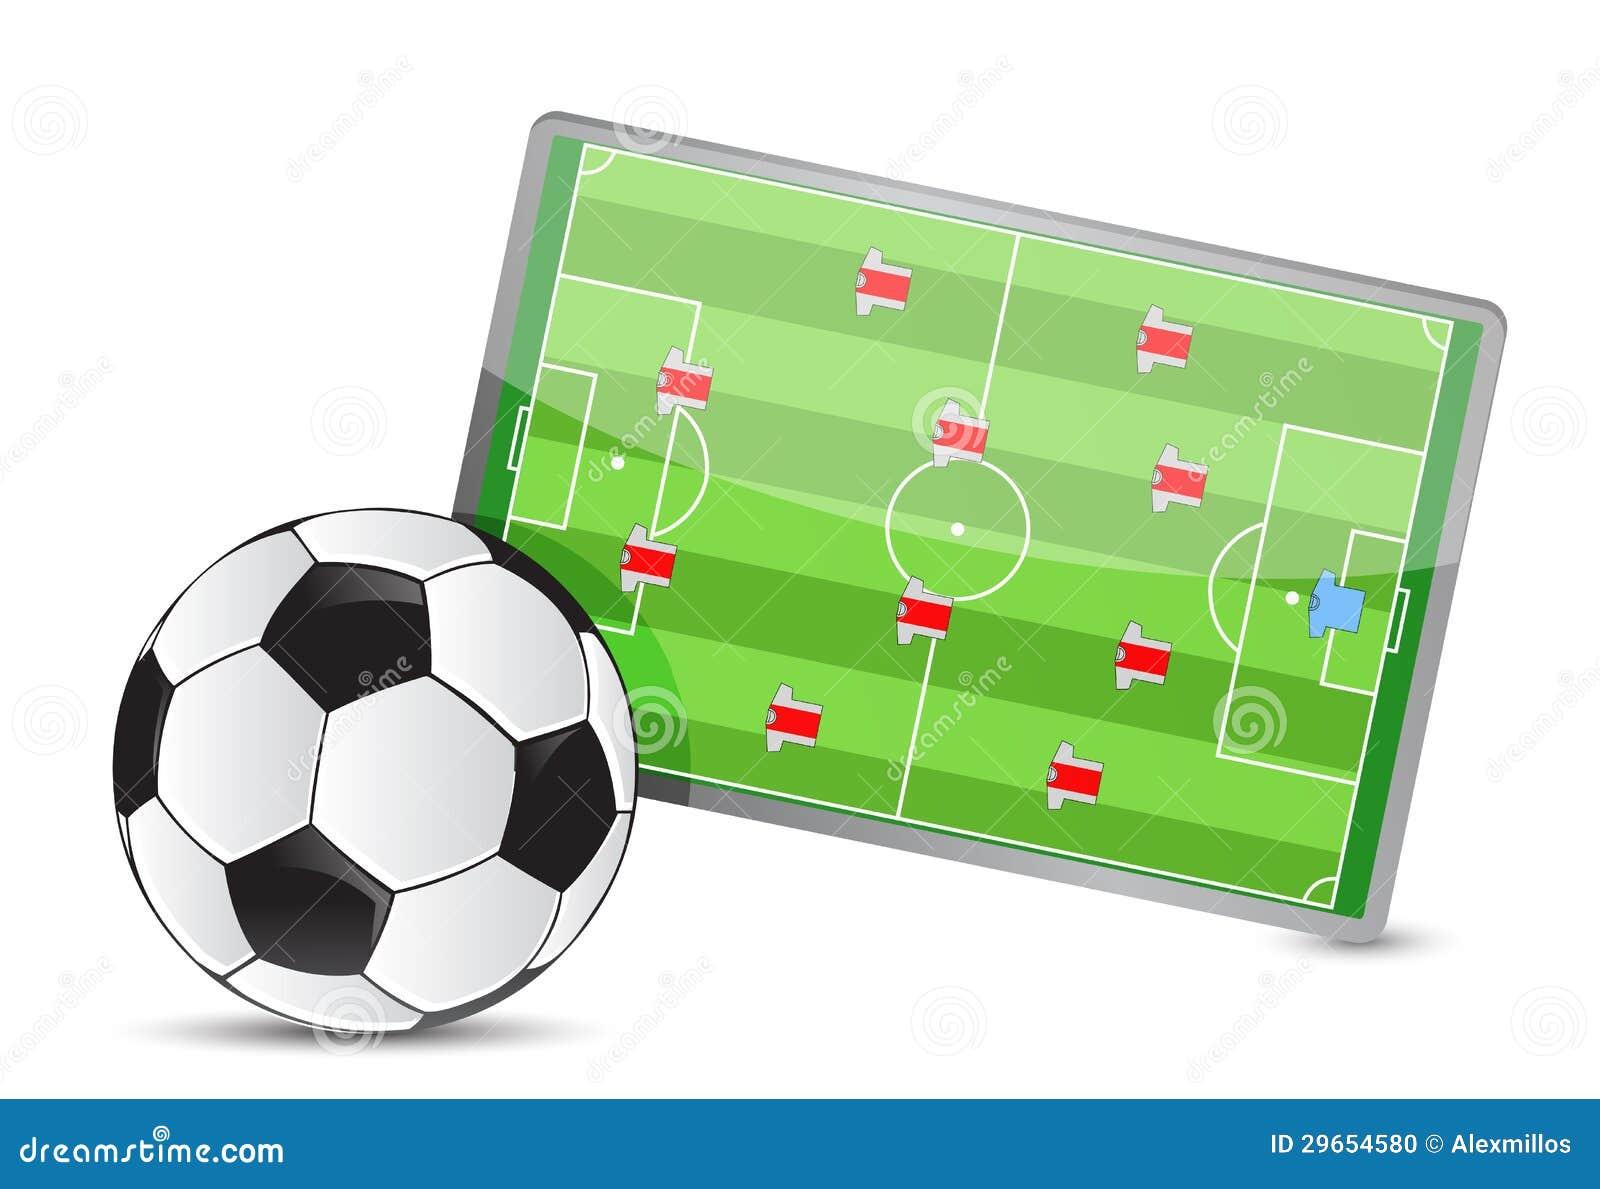 Table de la tactique de terrain de football, ballons de football